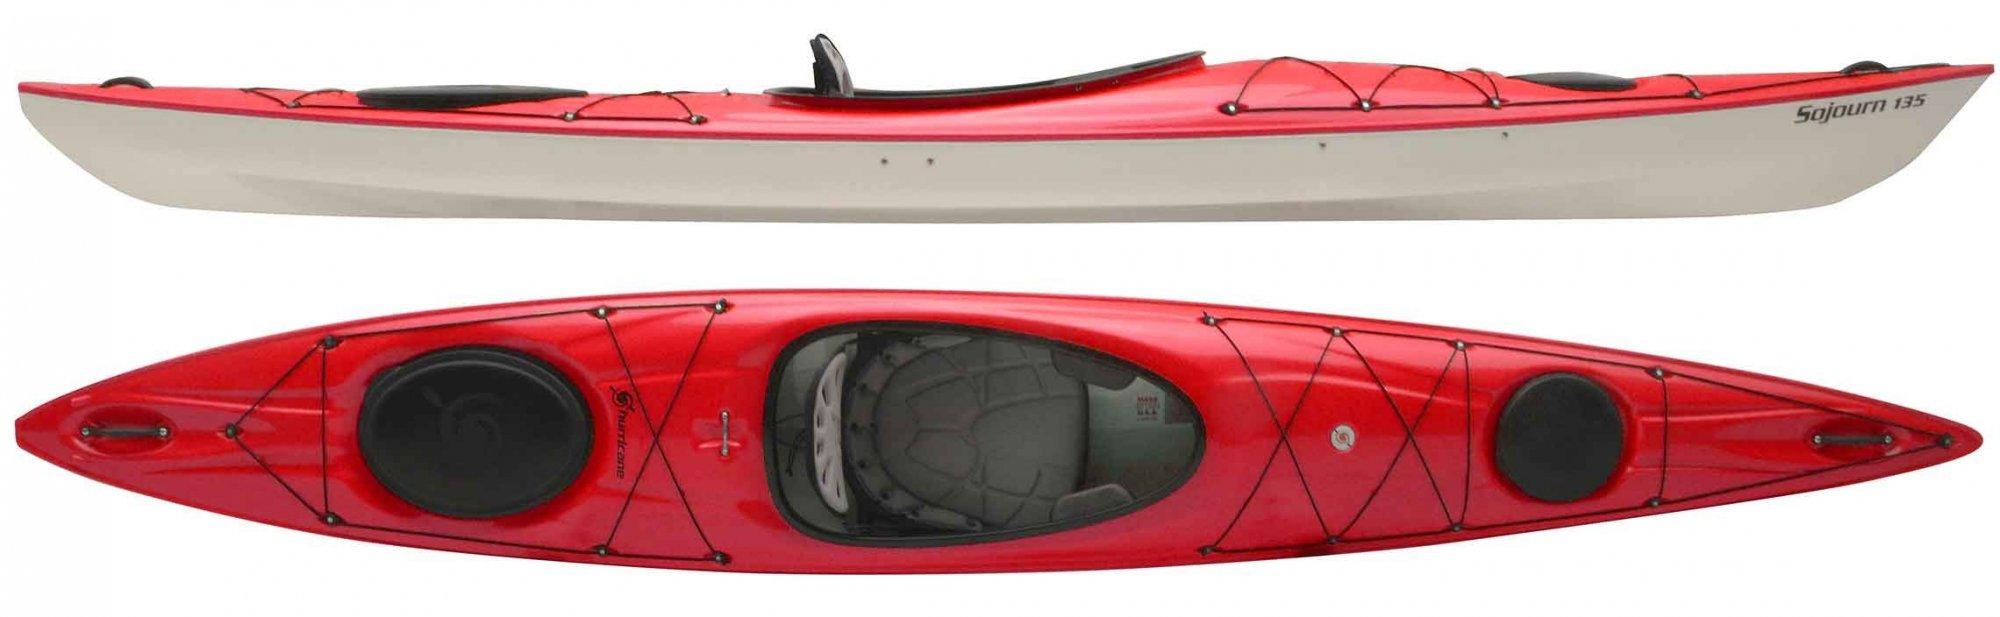 Hurricane Sojourn 135 Rudder Ready Kayak